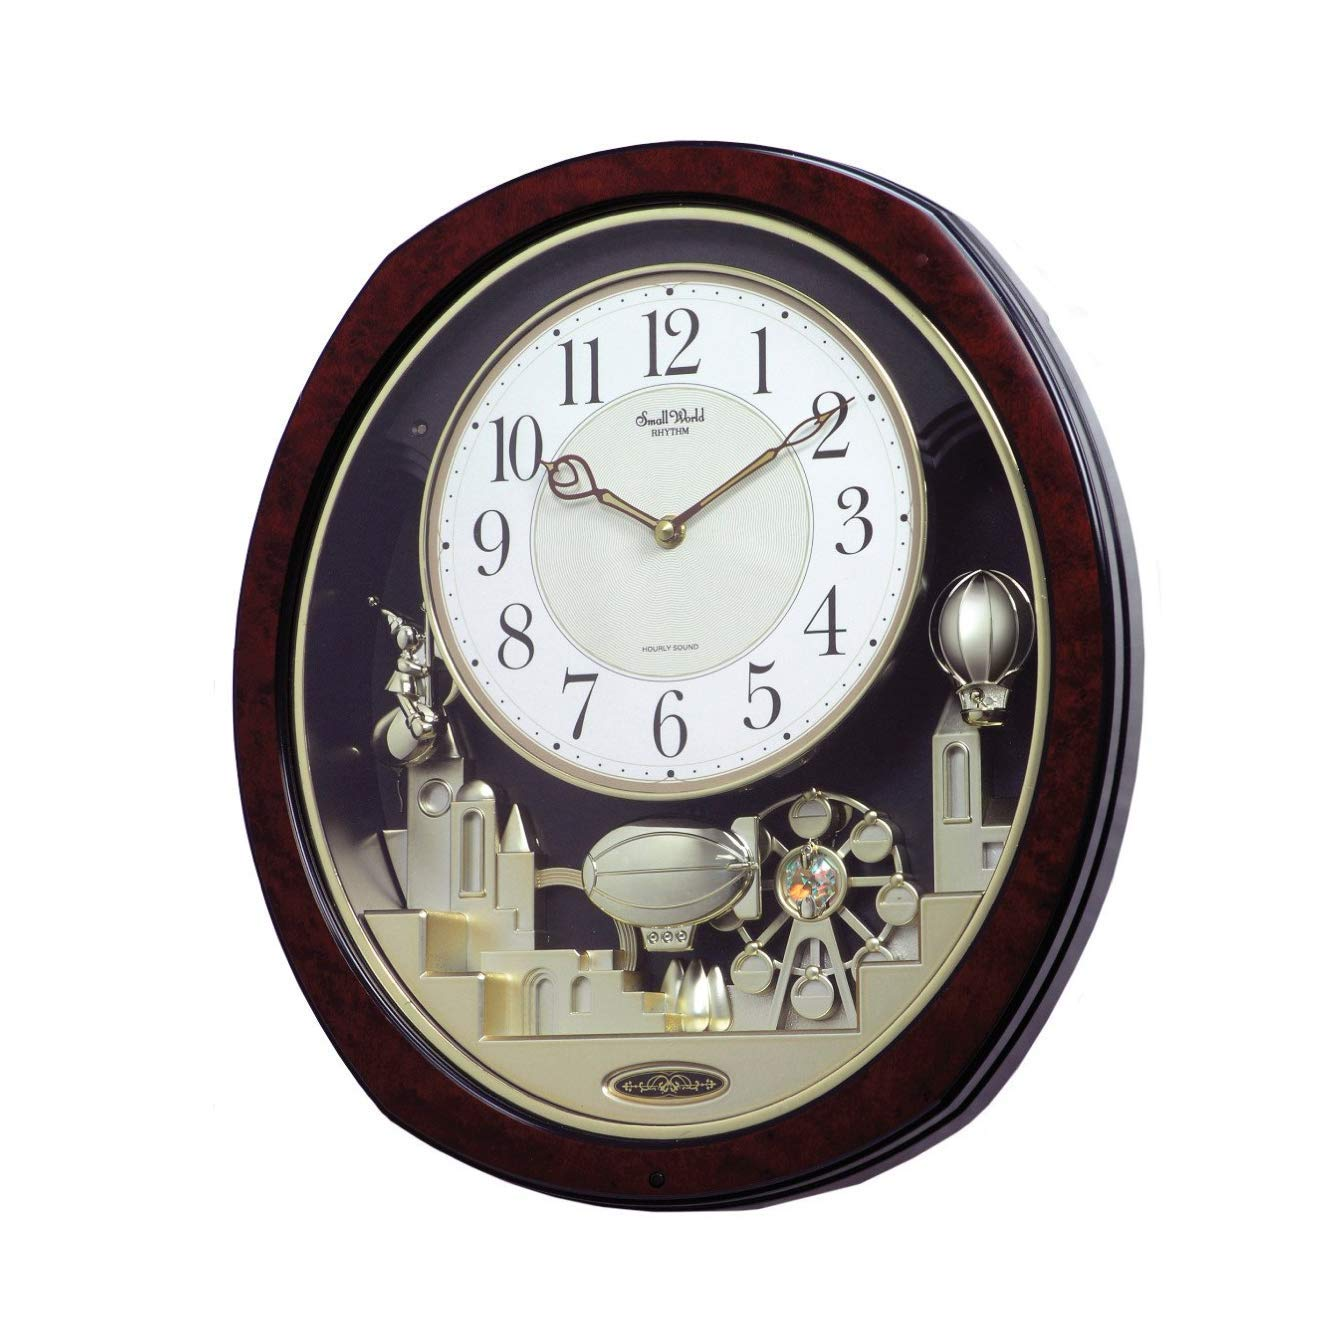 Rhythm Clocks Joyful Land Musical Motion Clock